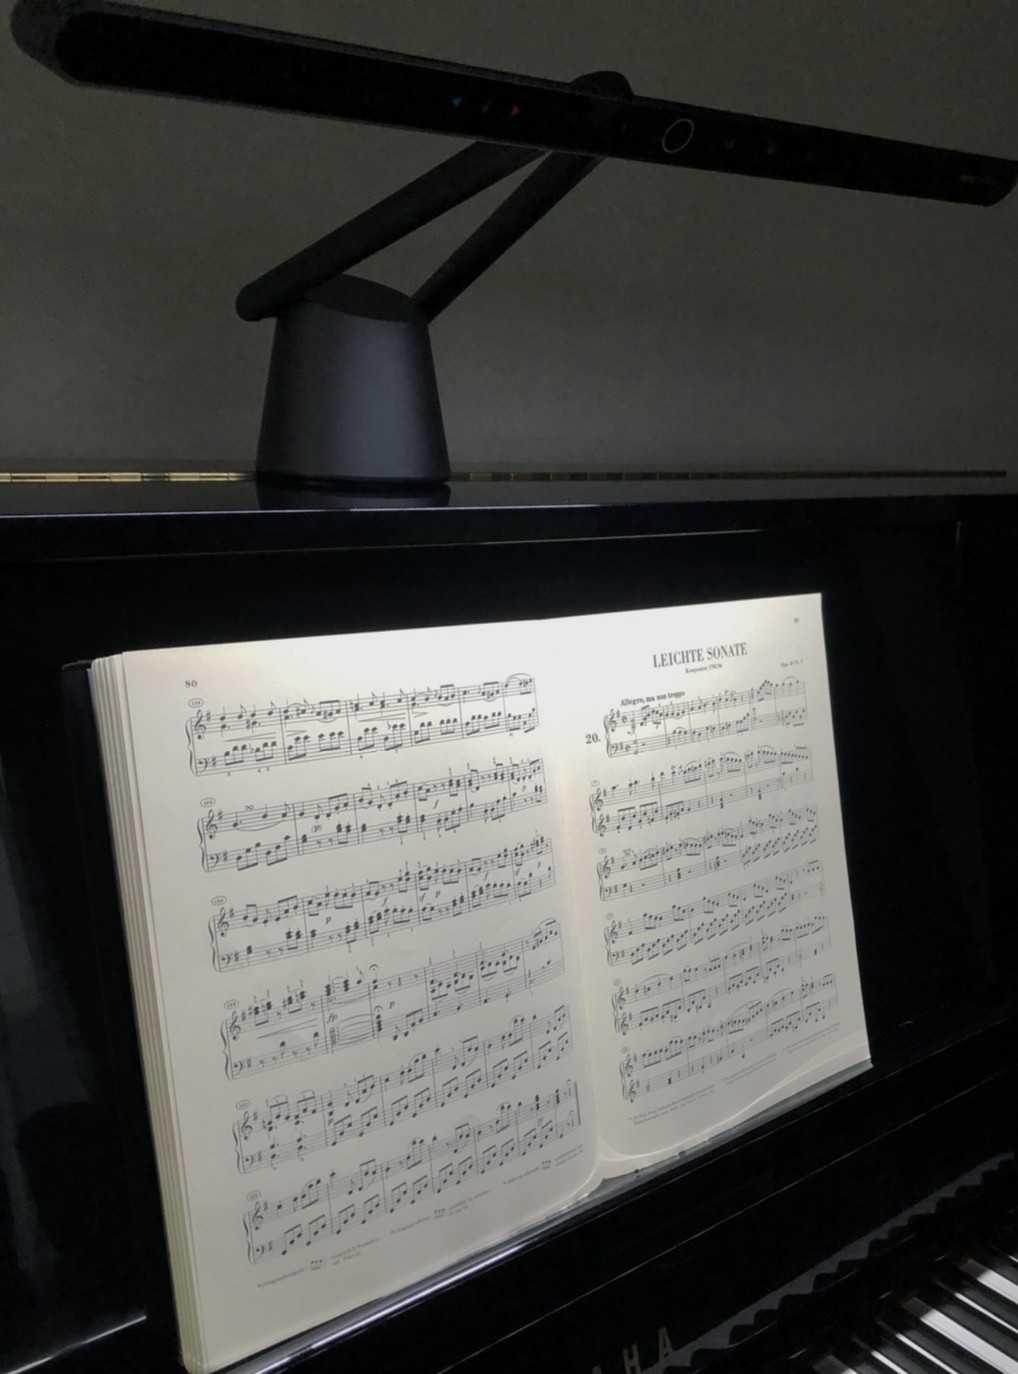 PianoLightの寒色の光